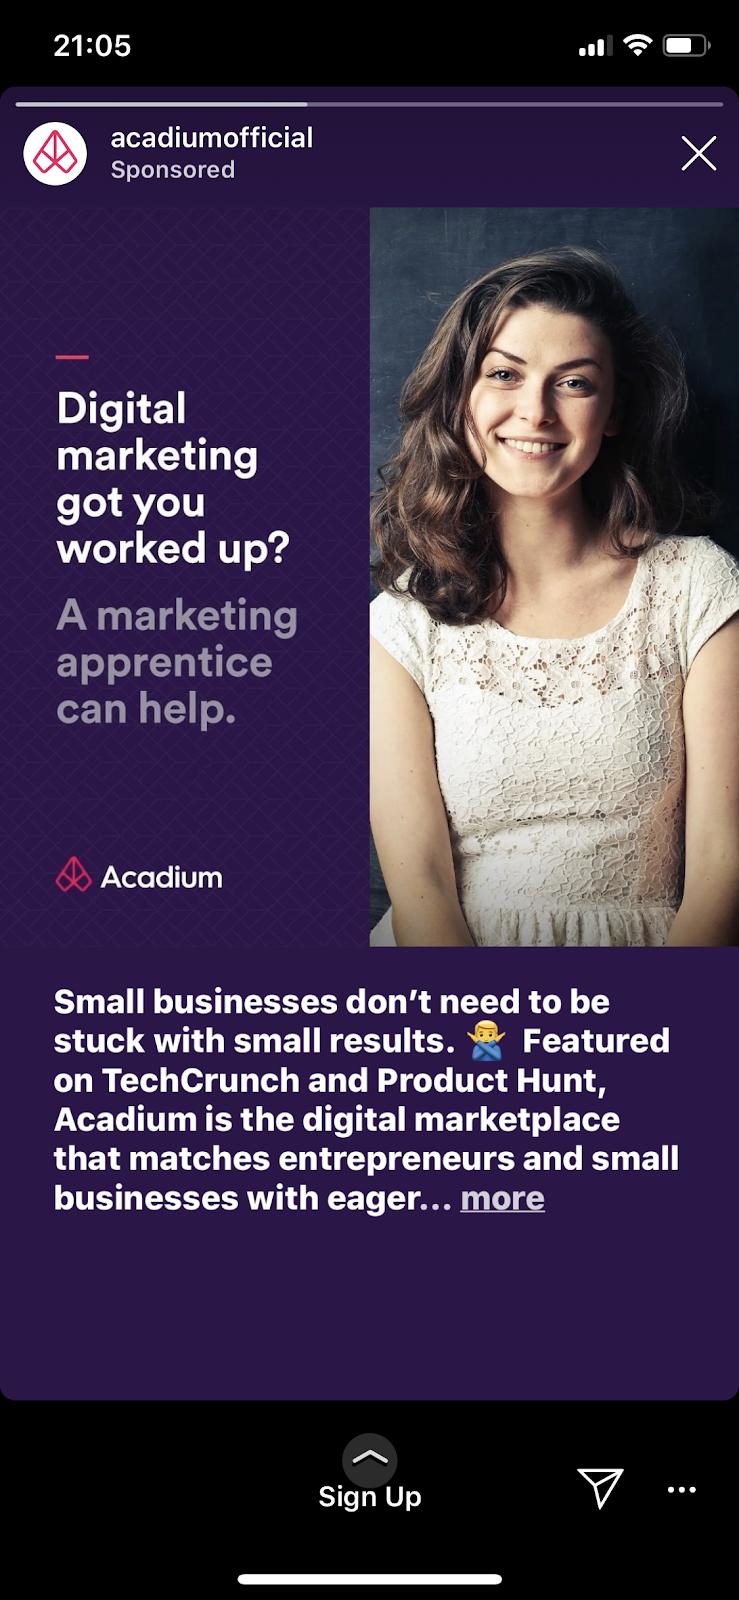 Acadium Instagram story image ad example